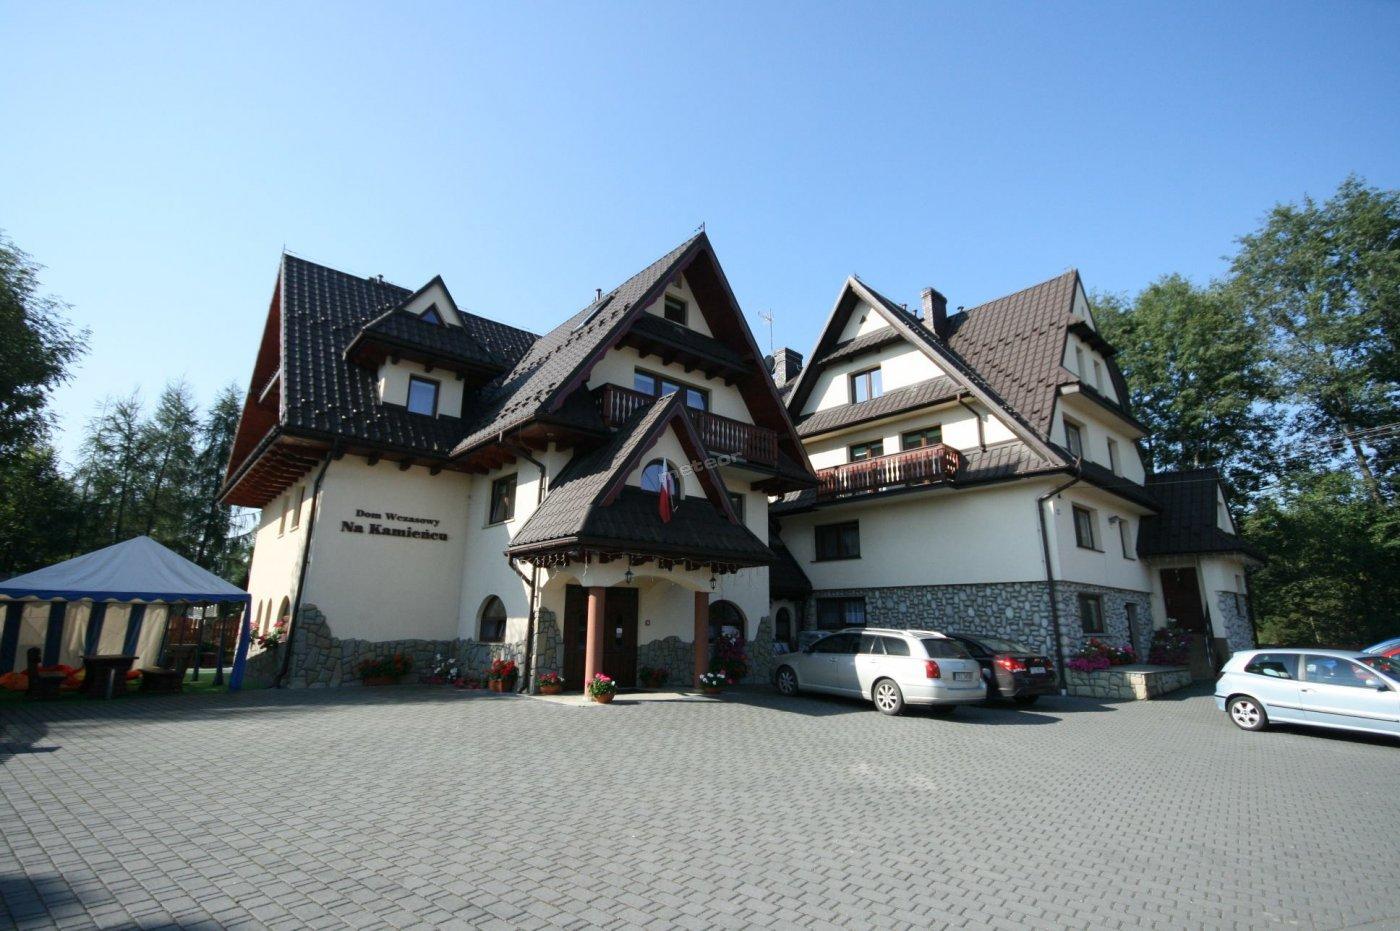 Noclegi Białka Tatrzańska - Na Kamieńcu